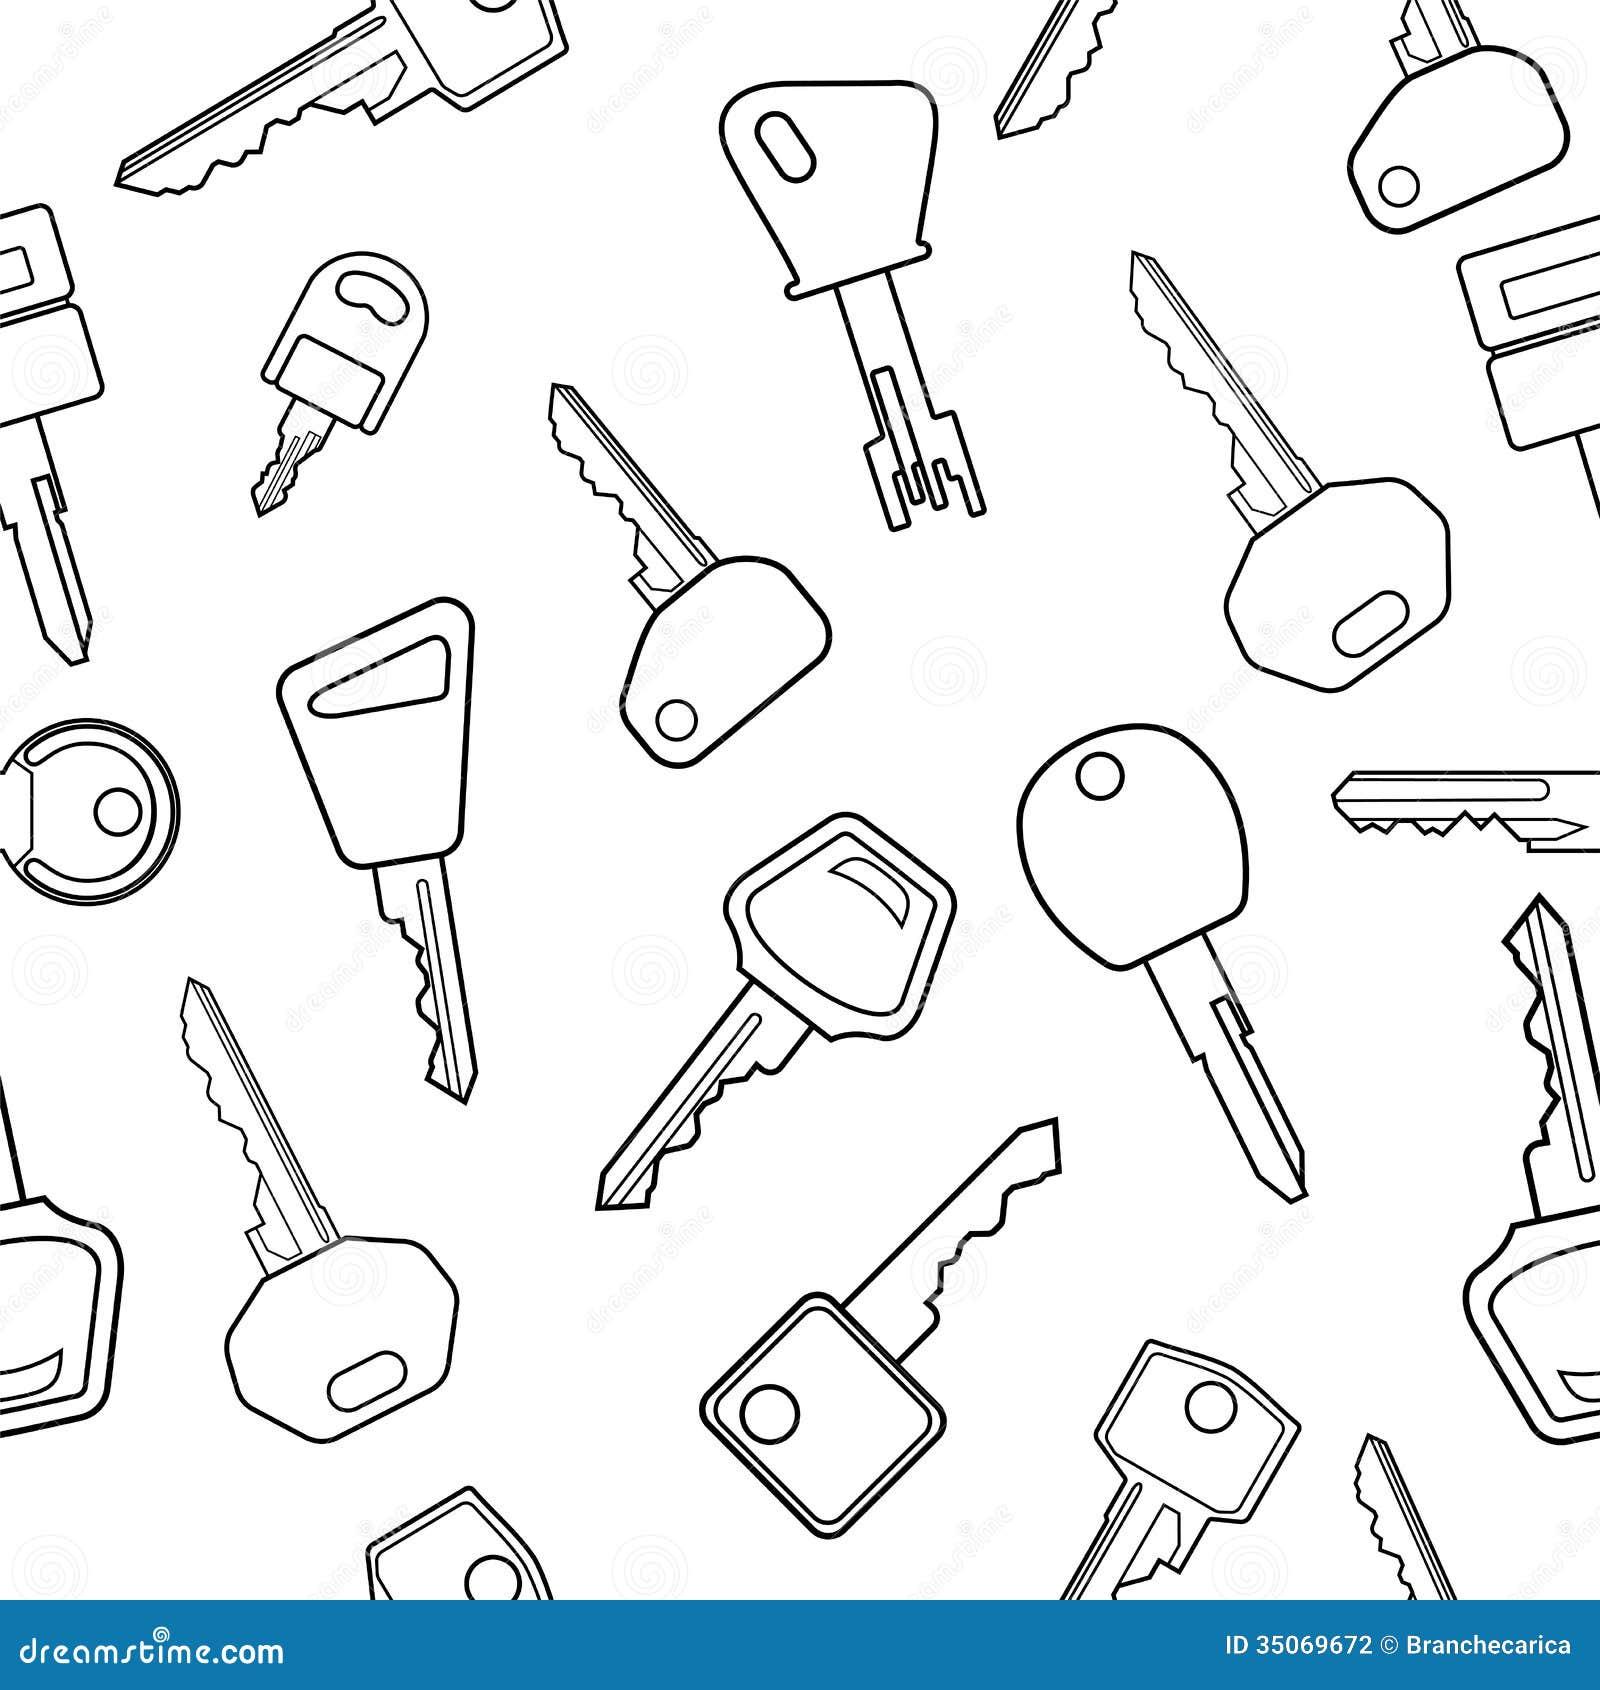 Vector Key Illustration: Key Pattern Stock Vector. Image Of Classic, Illustration